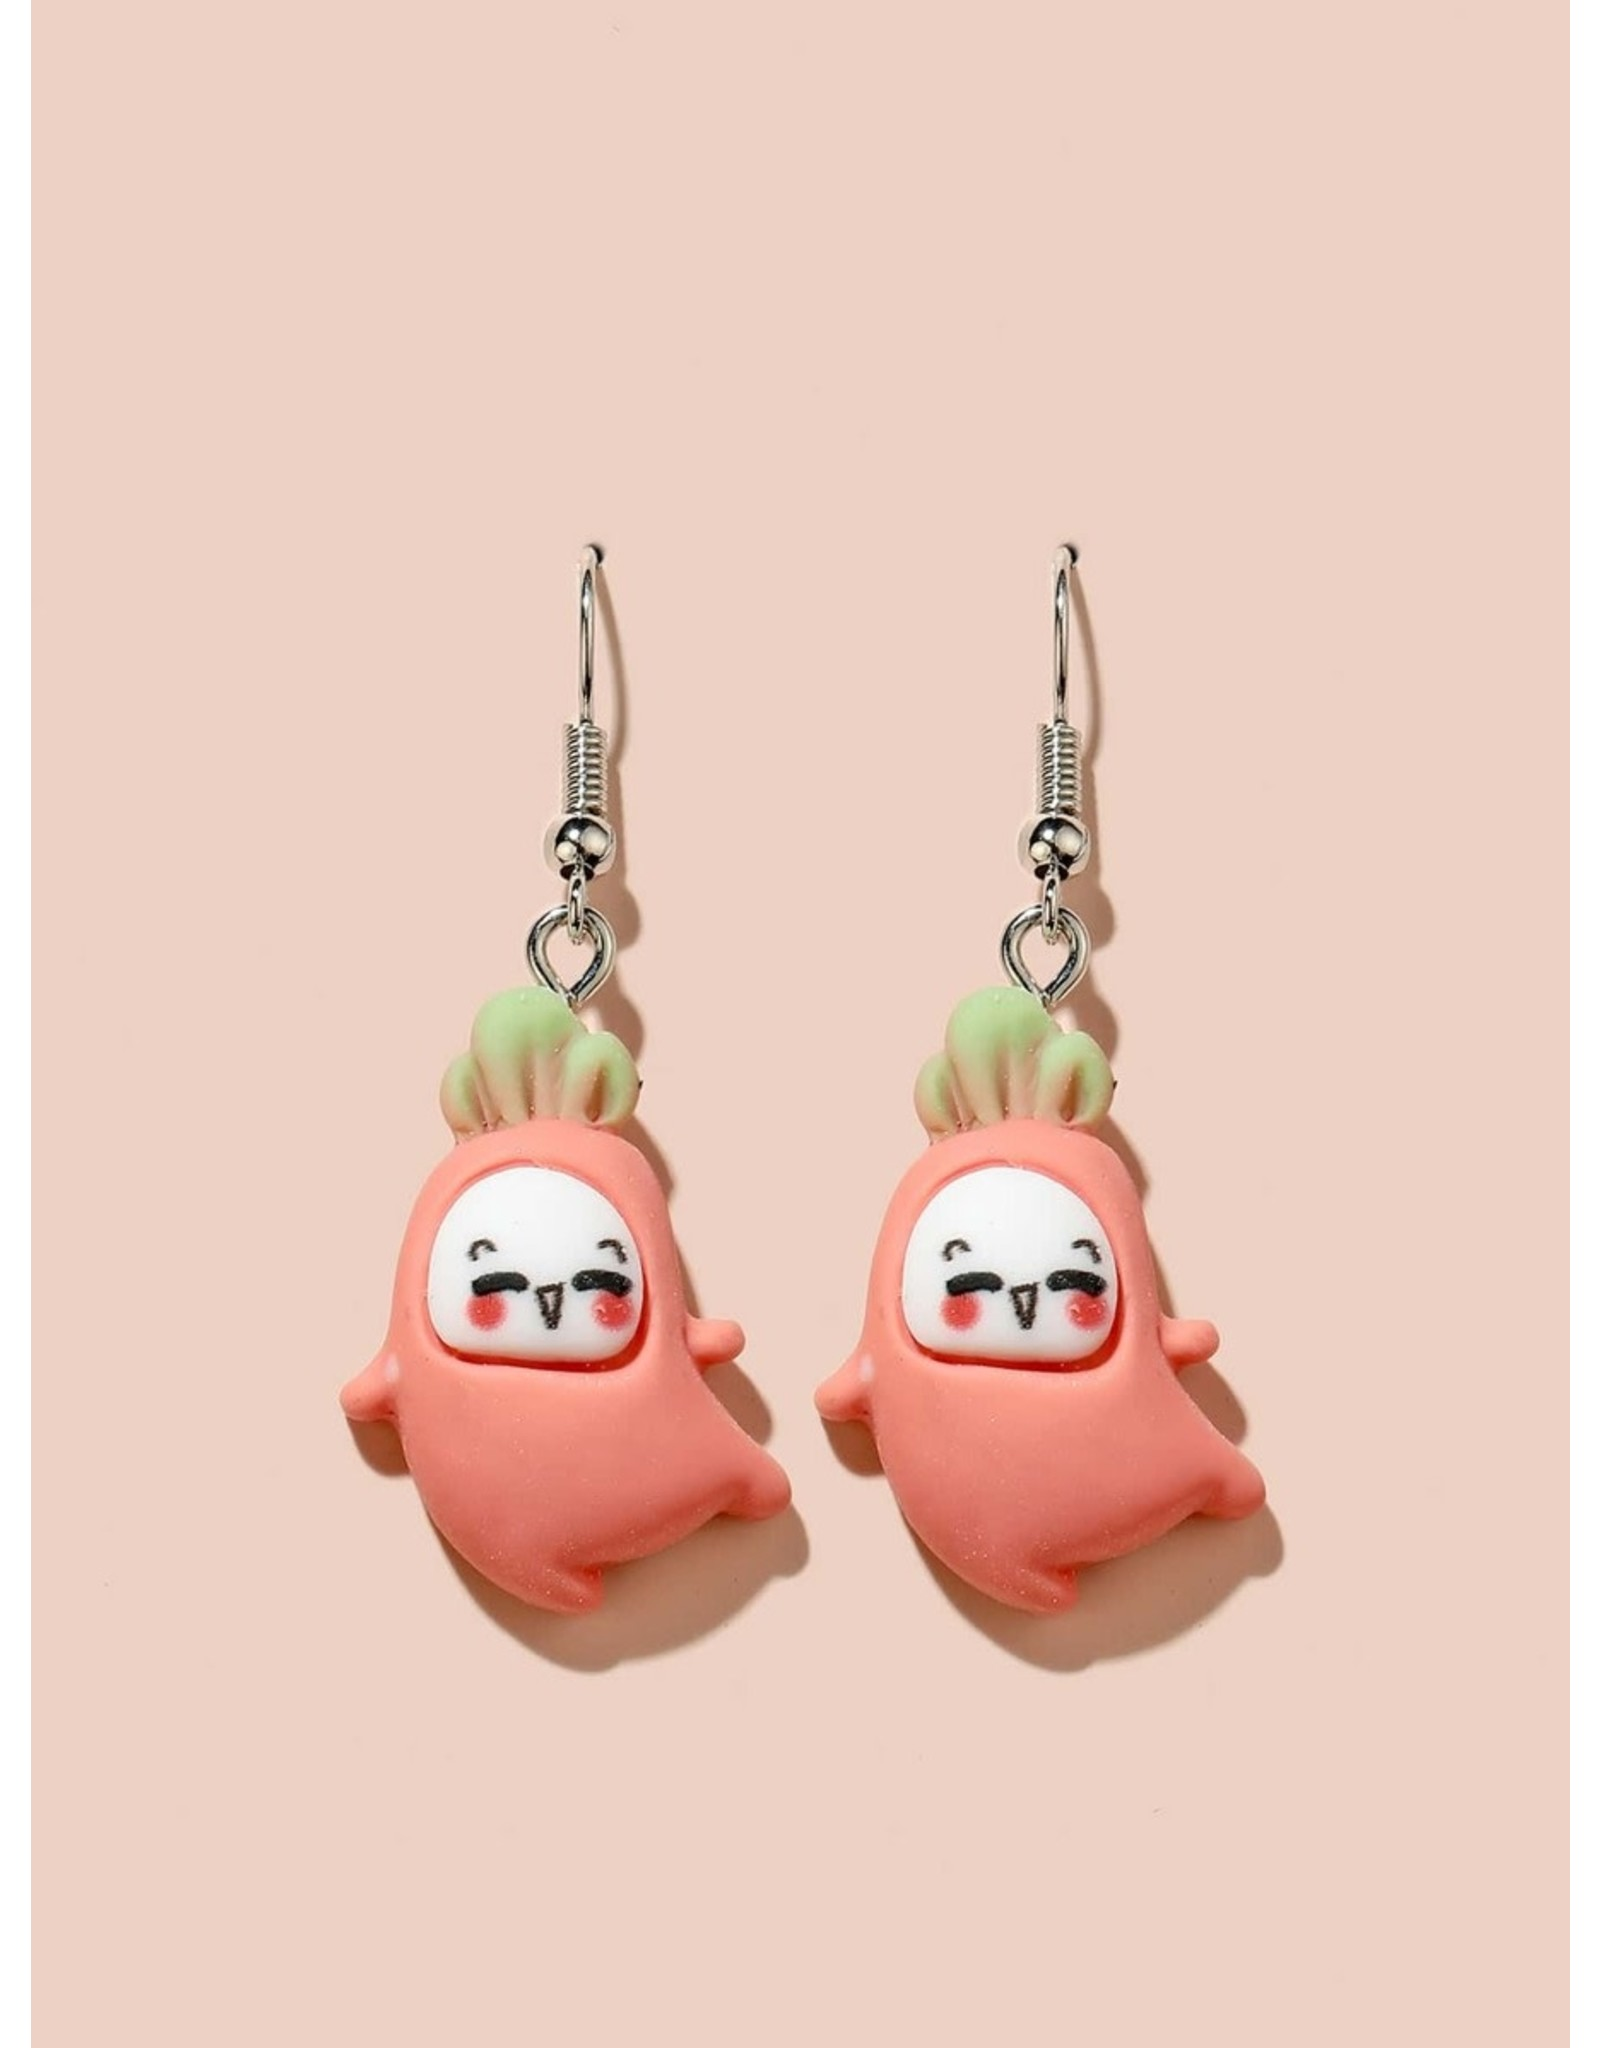 Earrings - Little Vegetable People